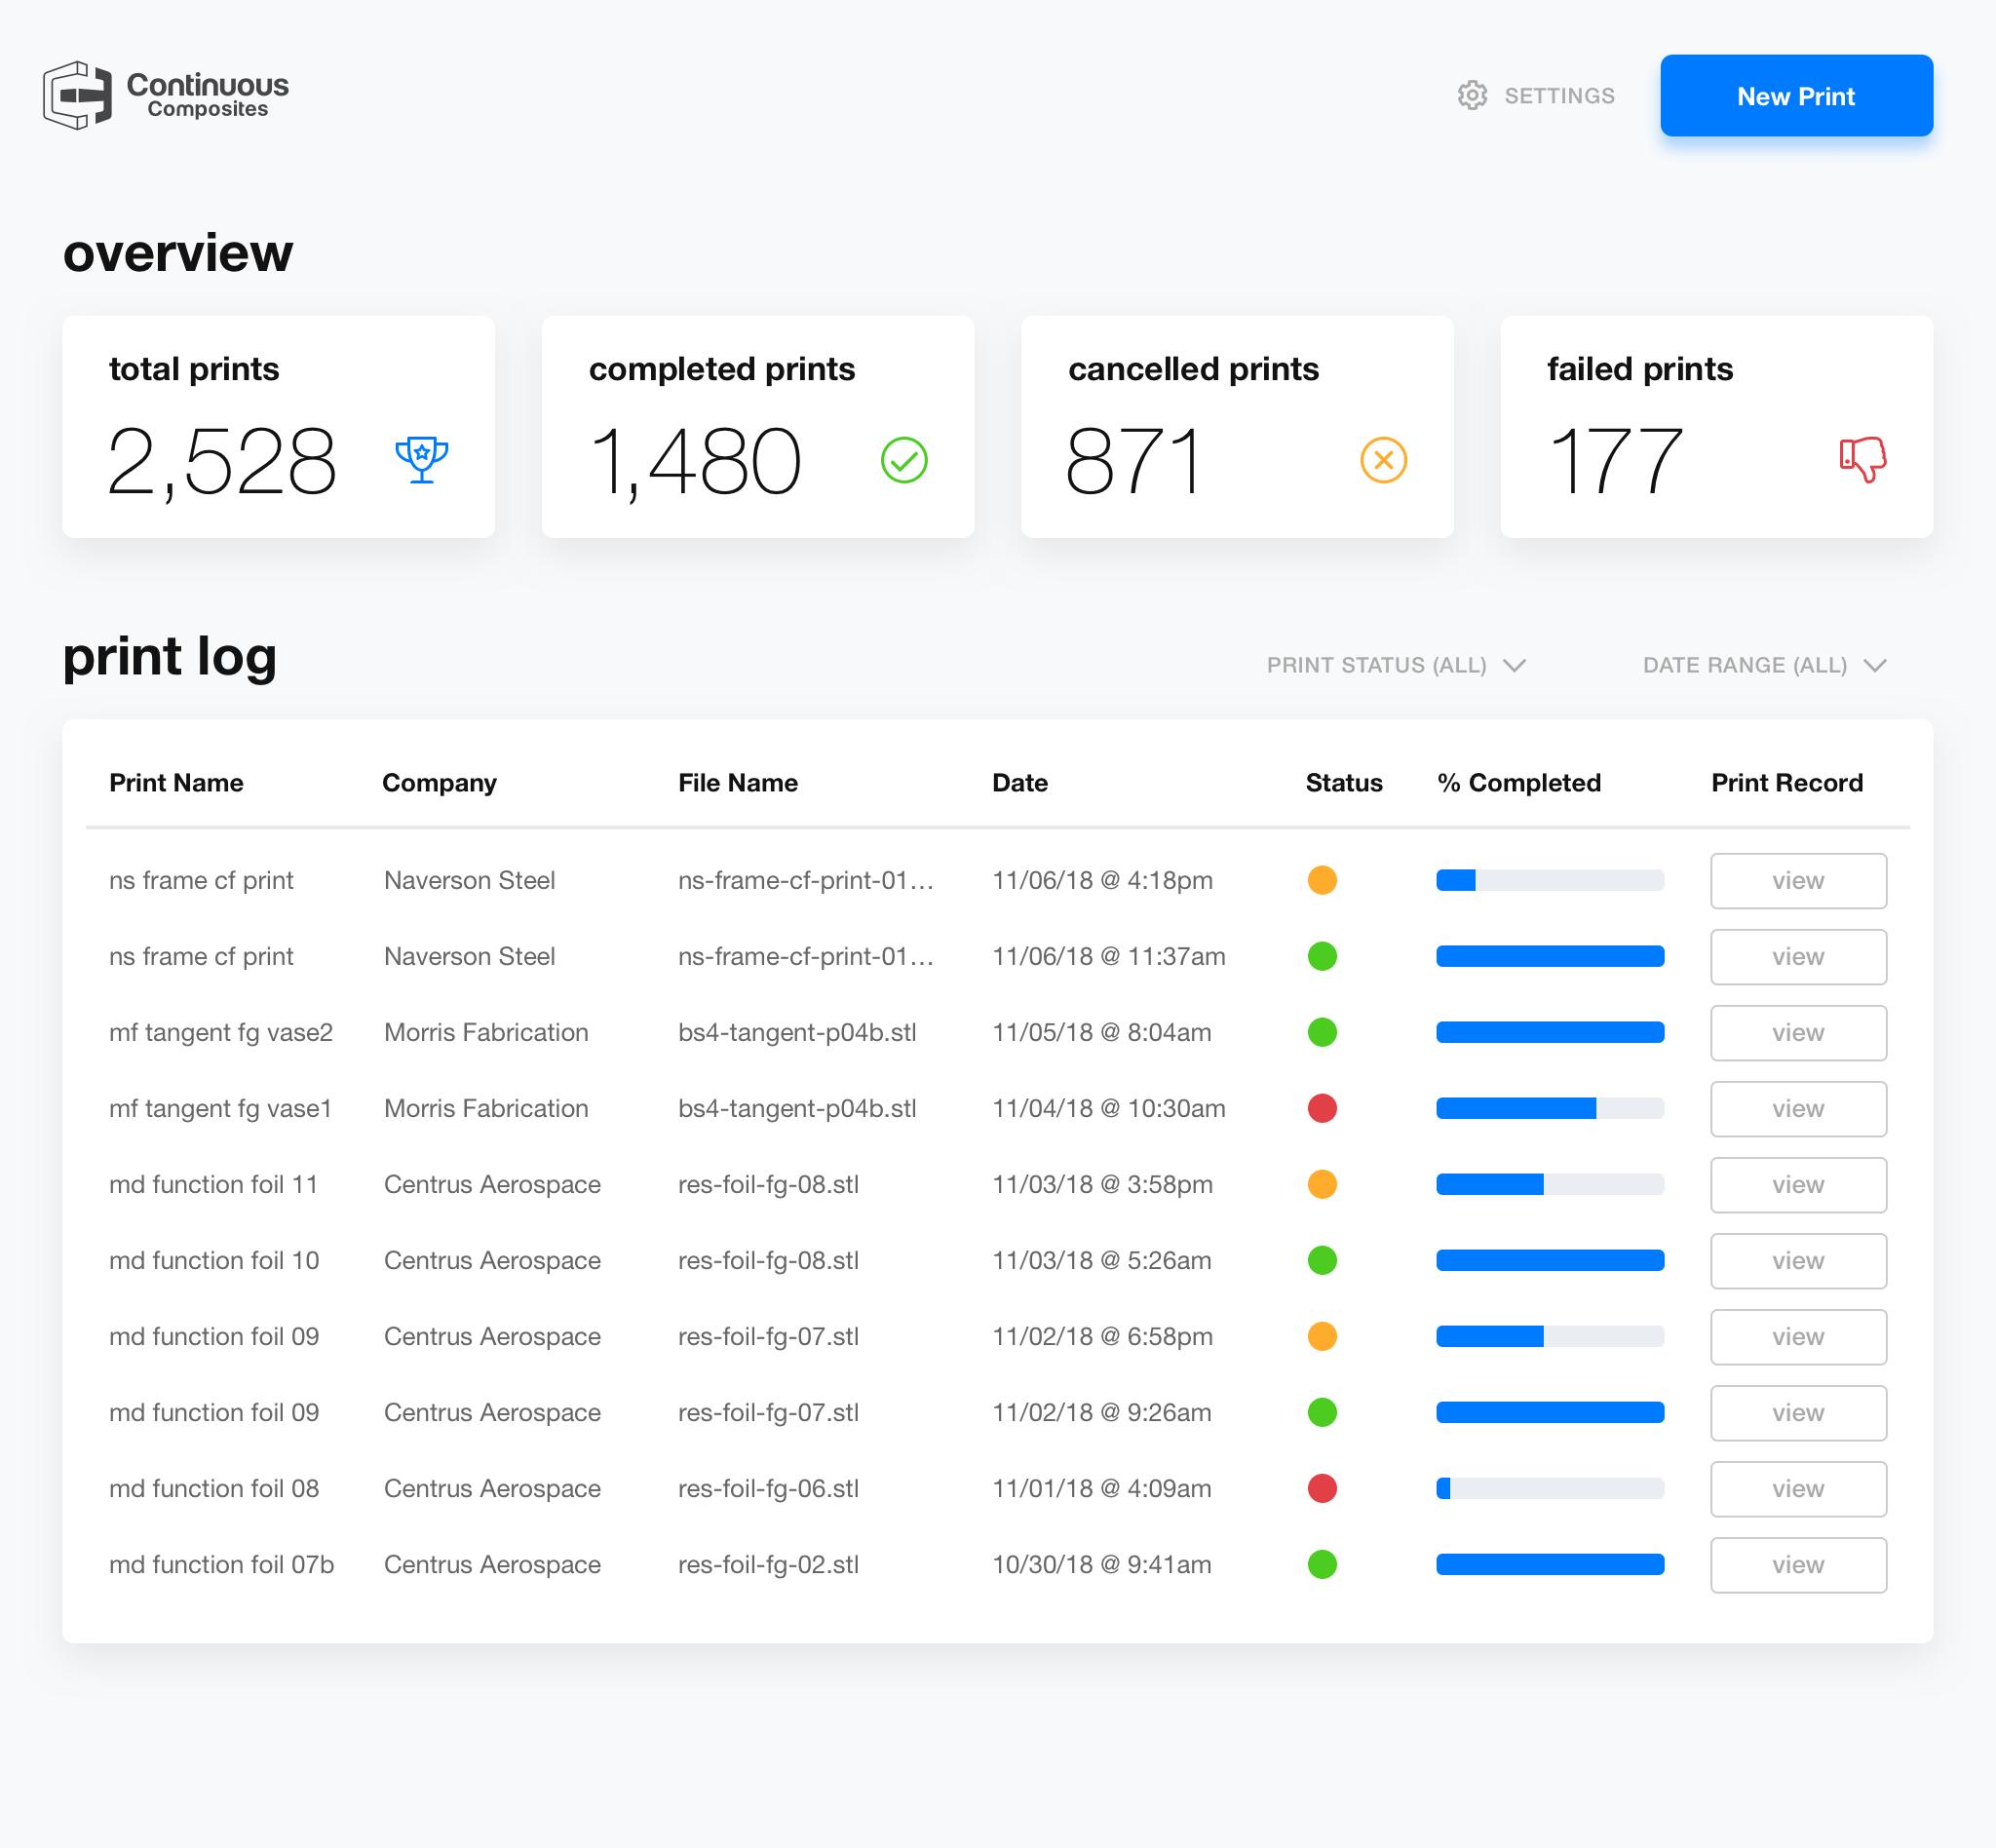 Robot Operating System dashboard showing print log